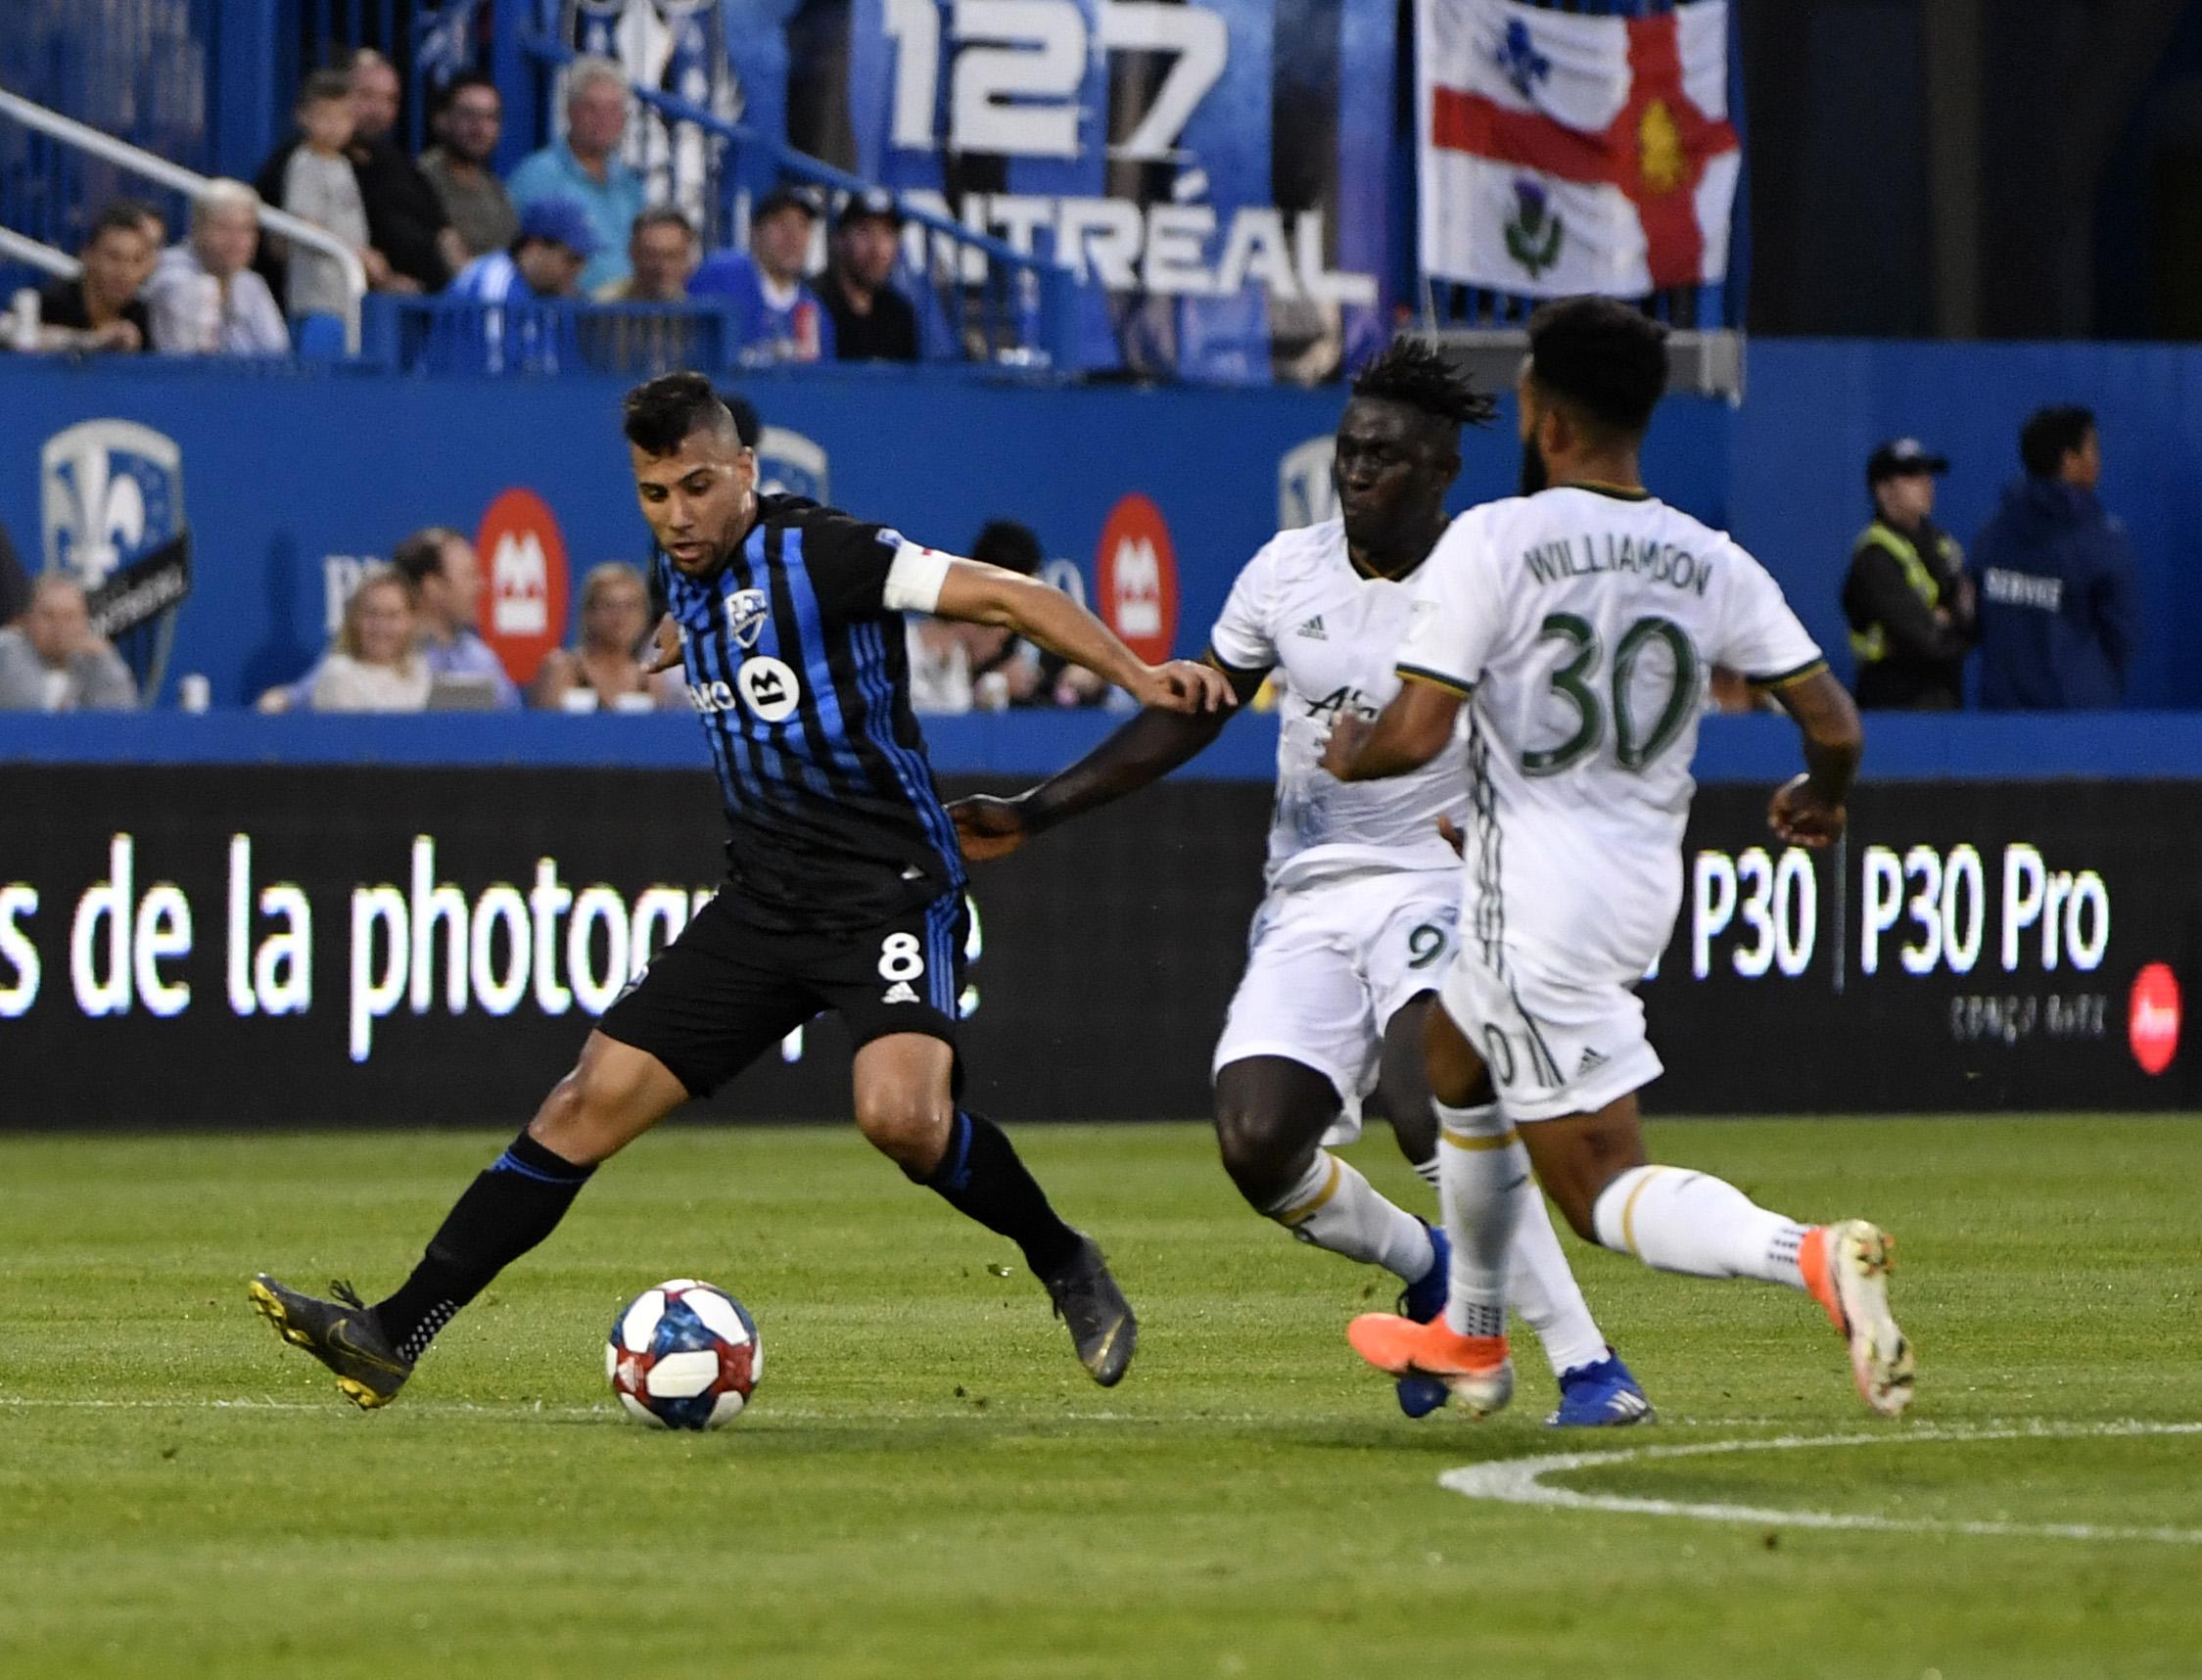 MLS: Portland Timbers at Montreal Impact